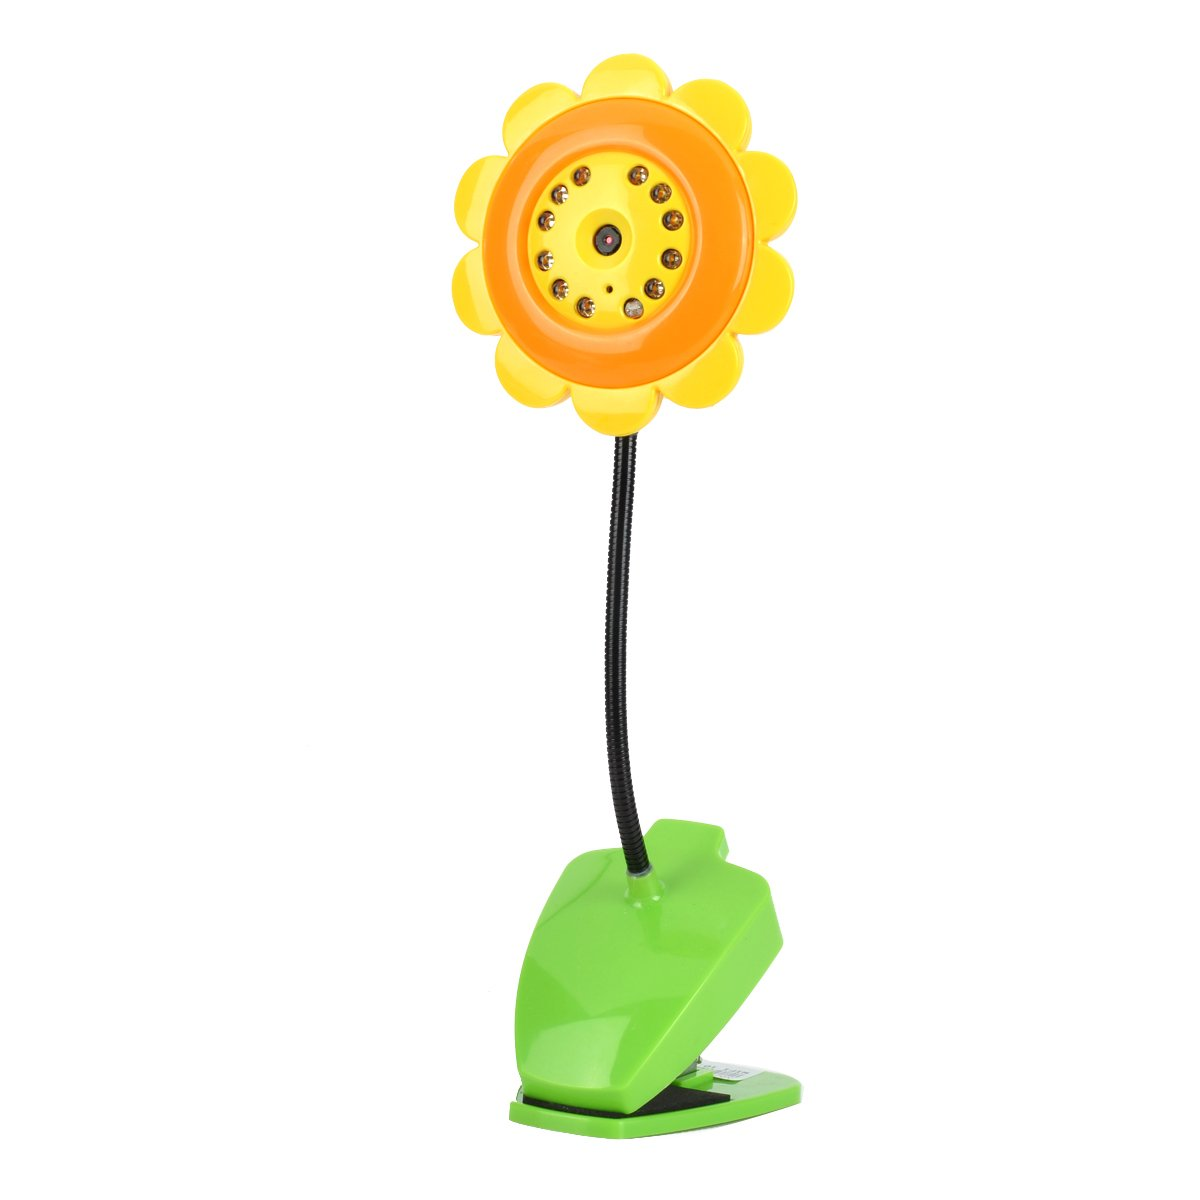 OLSUS Sunflower Style Wireless Wi-Fi 0.3MP CMOS Camera